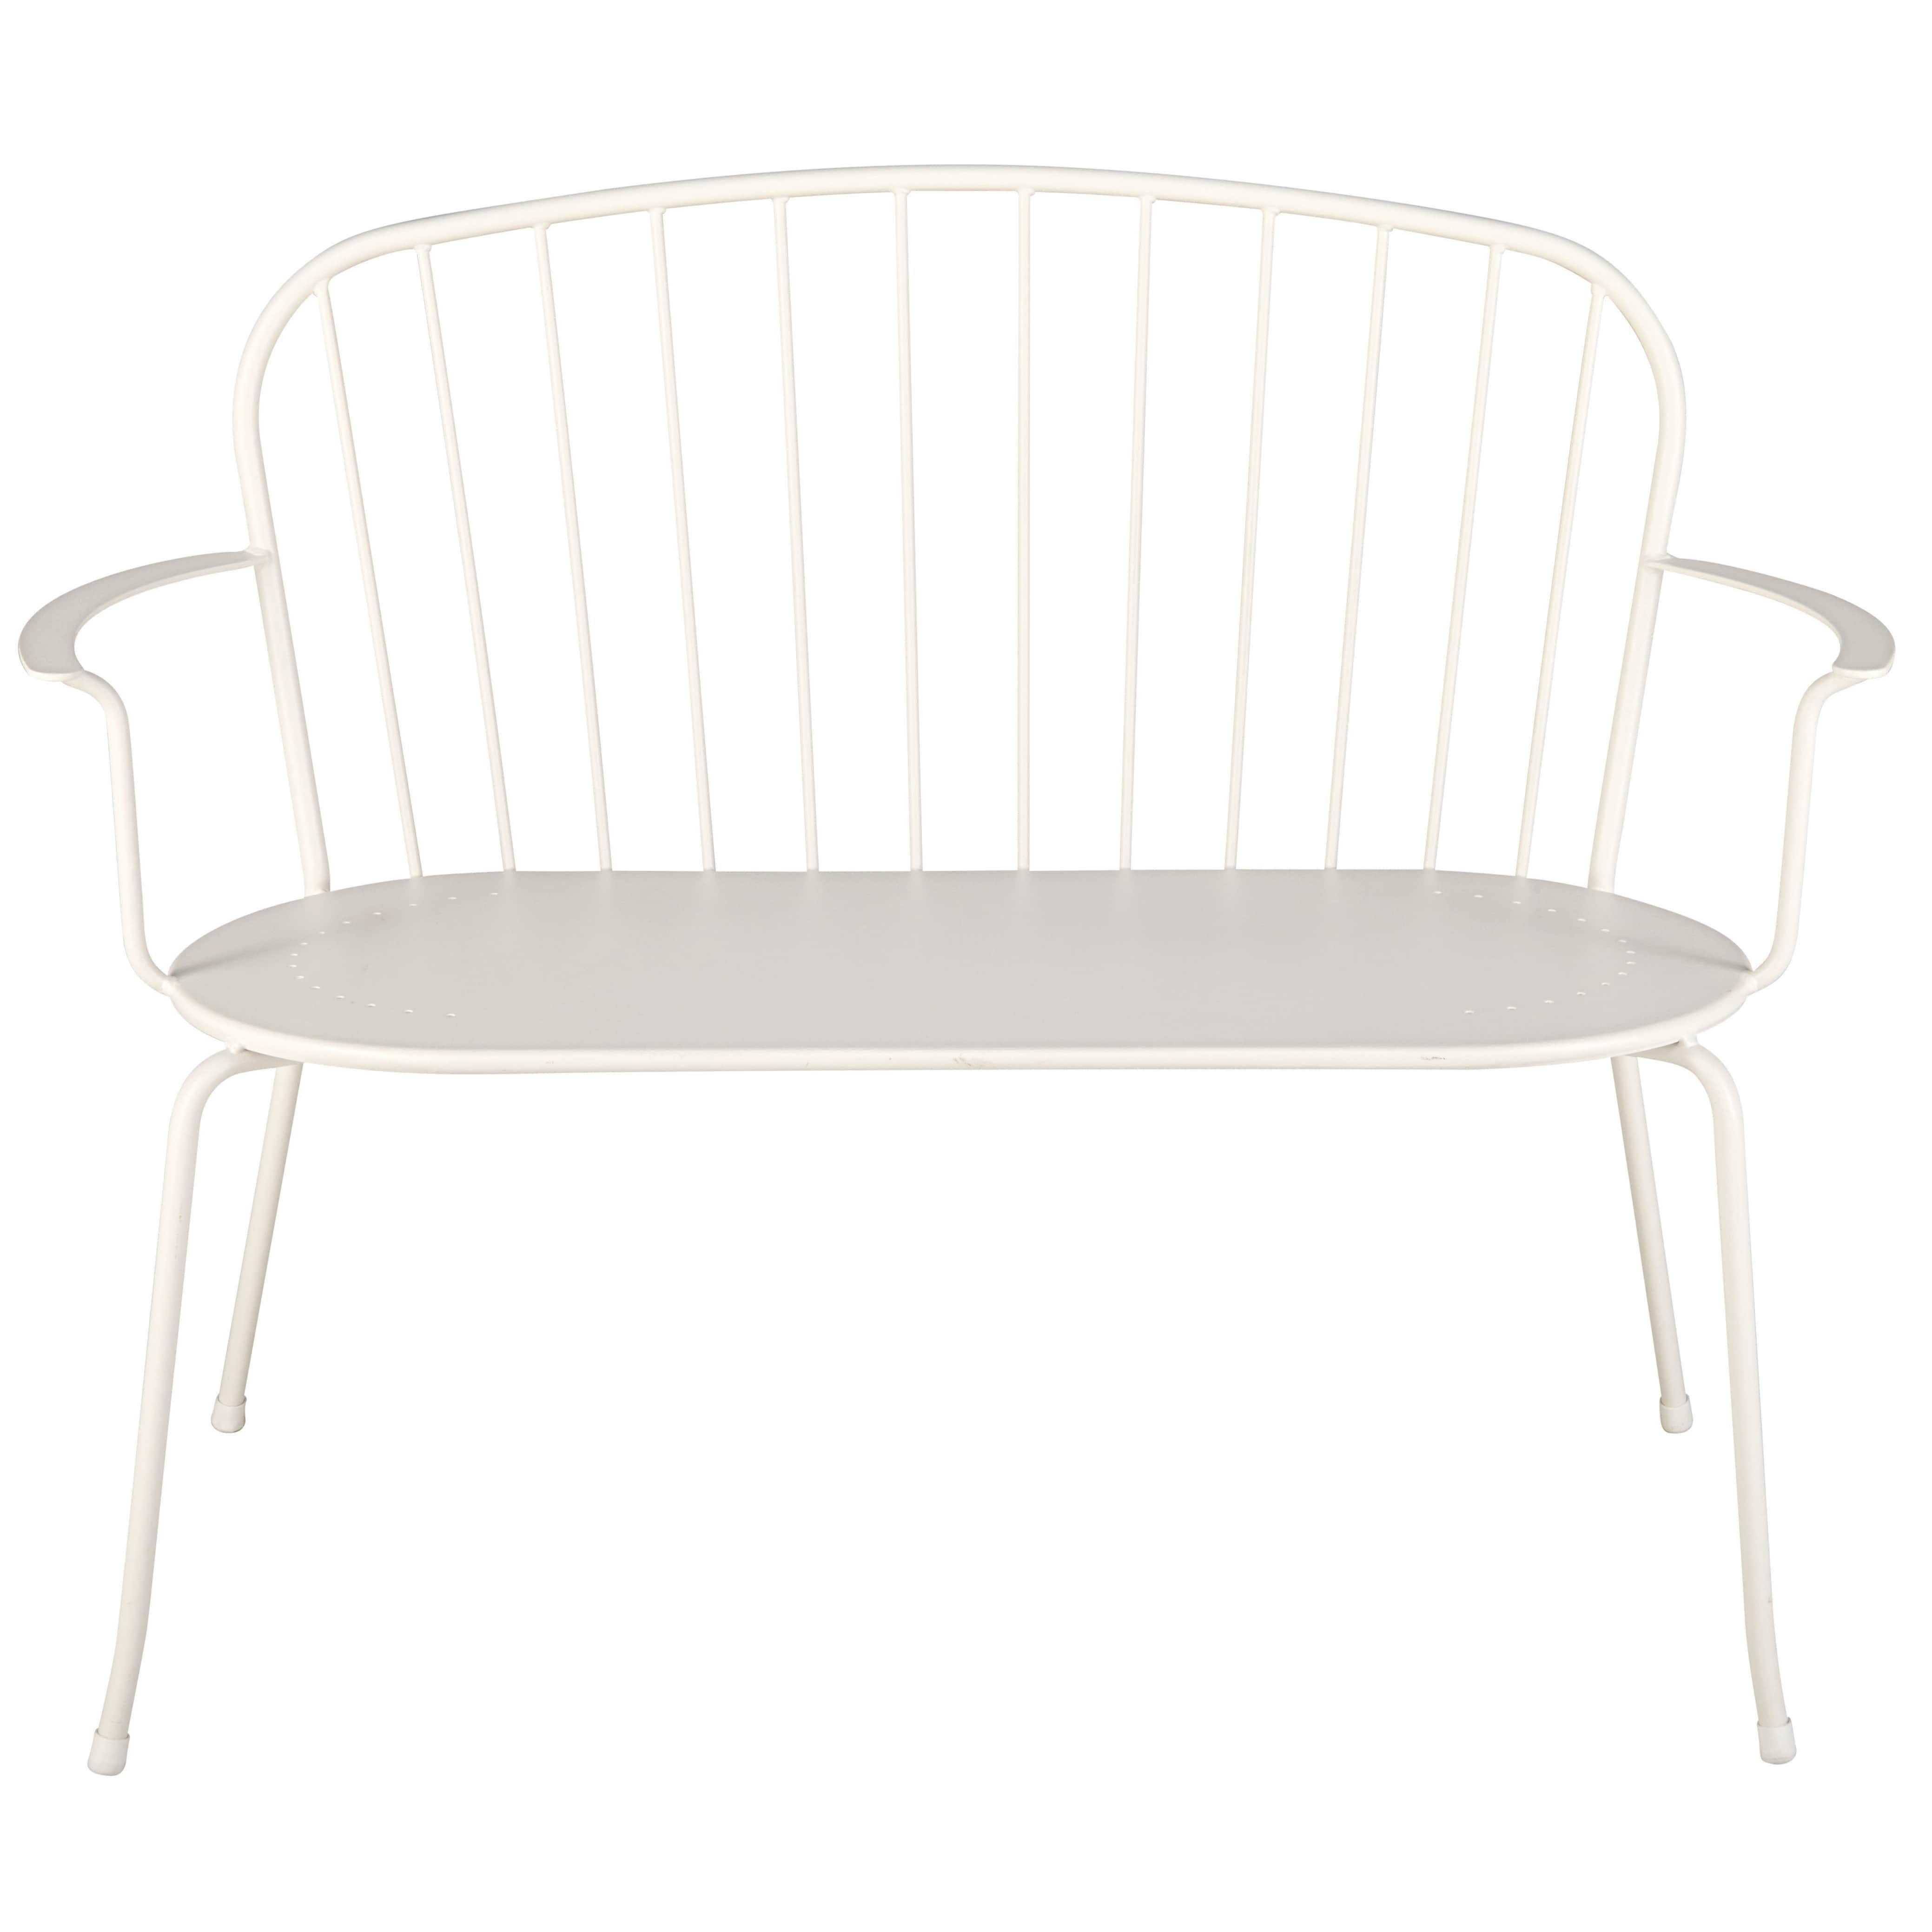 stapelbare gartenbank 2 3 sitzer aus elfenbeinfarbenem metall holly interior love pinterest. Black Bedroom Furniture Sets. Home Design Ideas